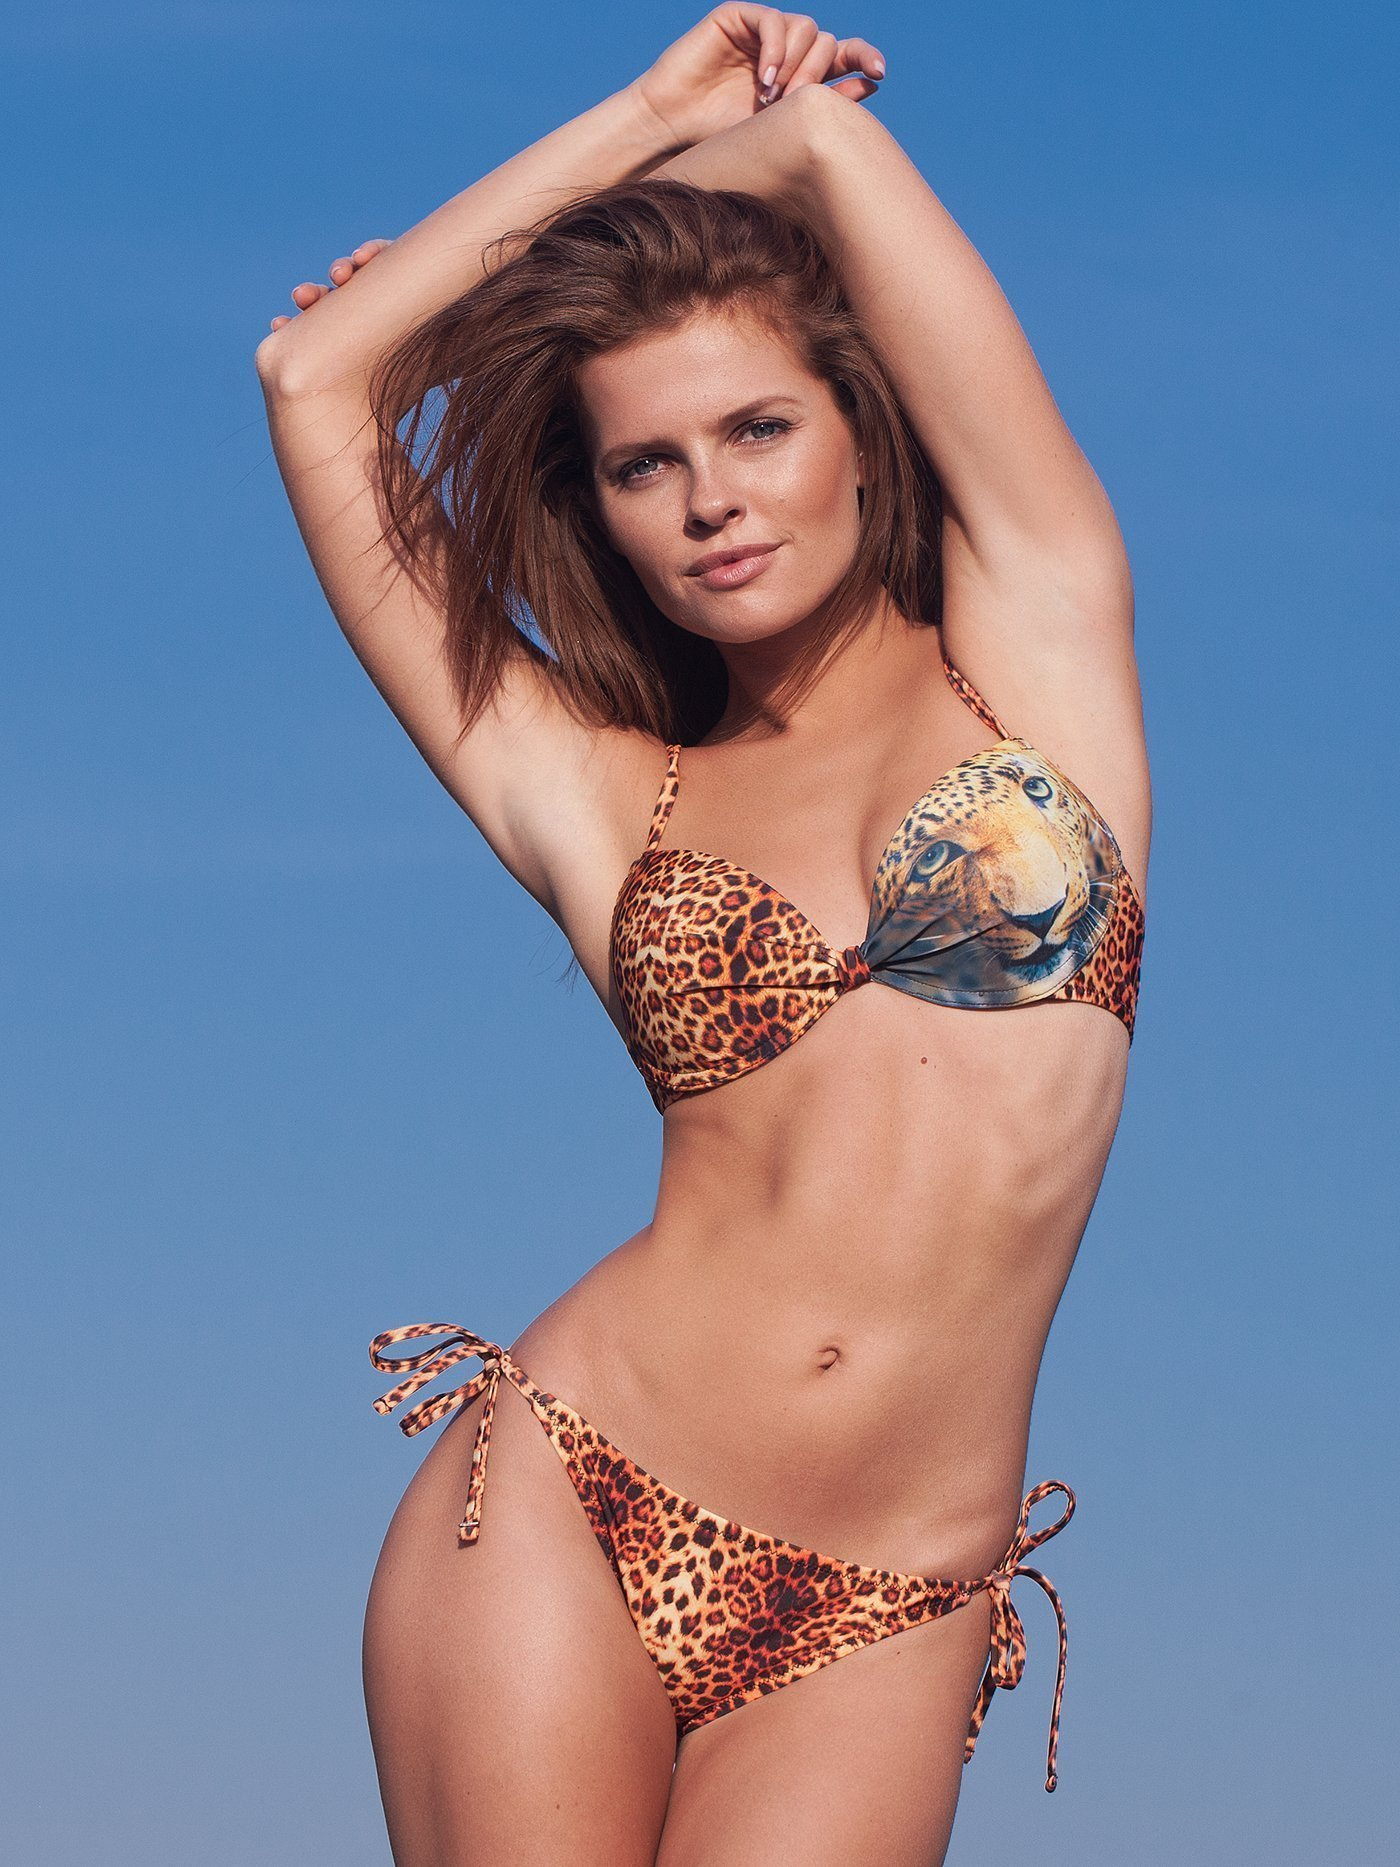 Плавки бикини дефиле tropical reality купить в интернет-магазине в Москве, цена 199.00 |tropical reality